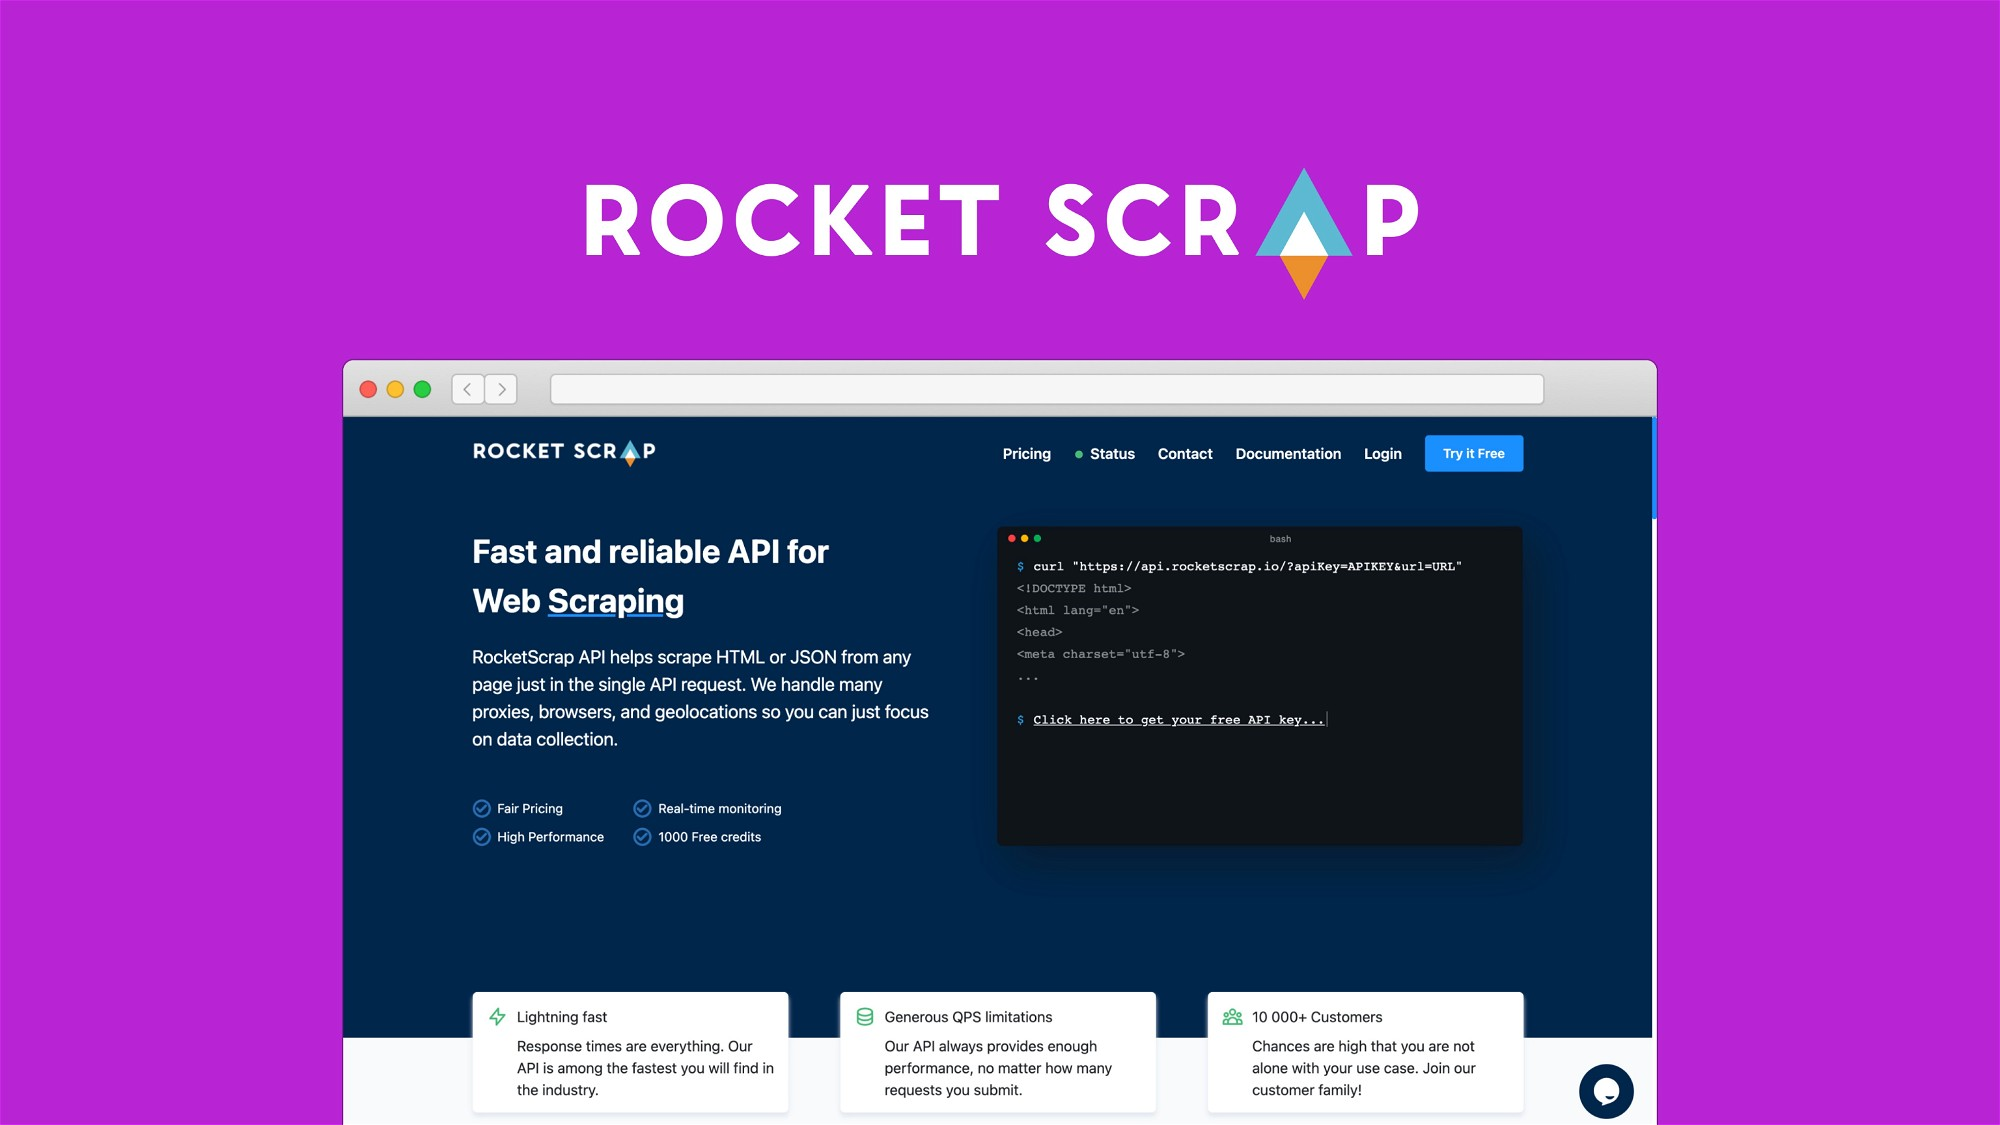 AppSumo Deal for RocketScrap